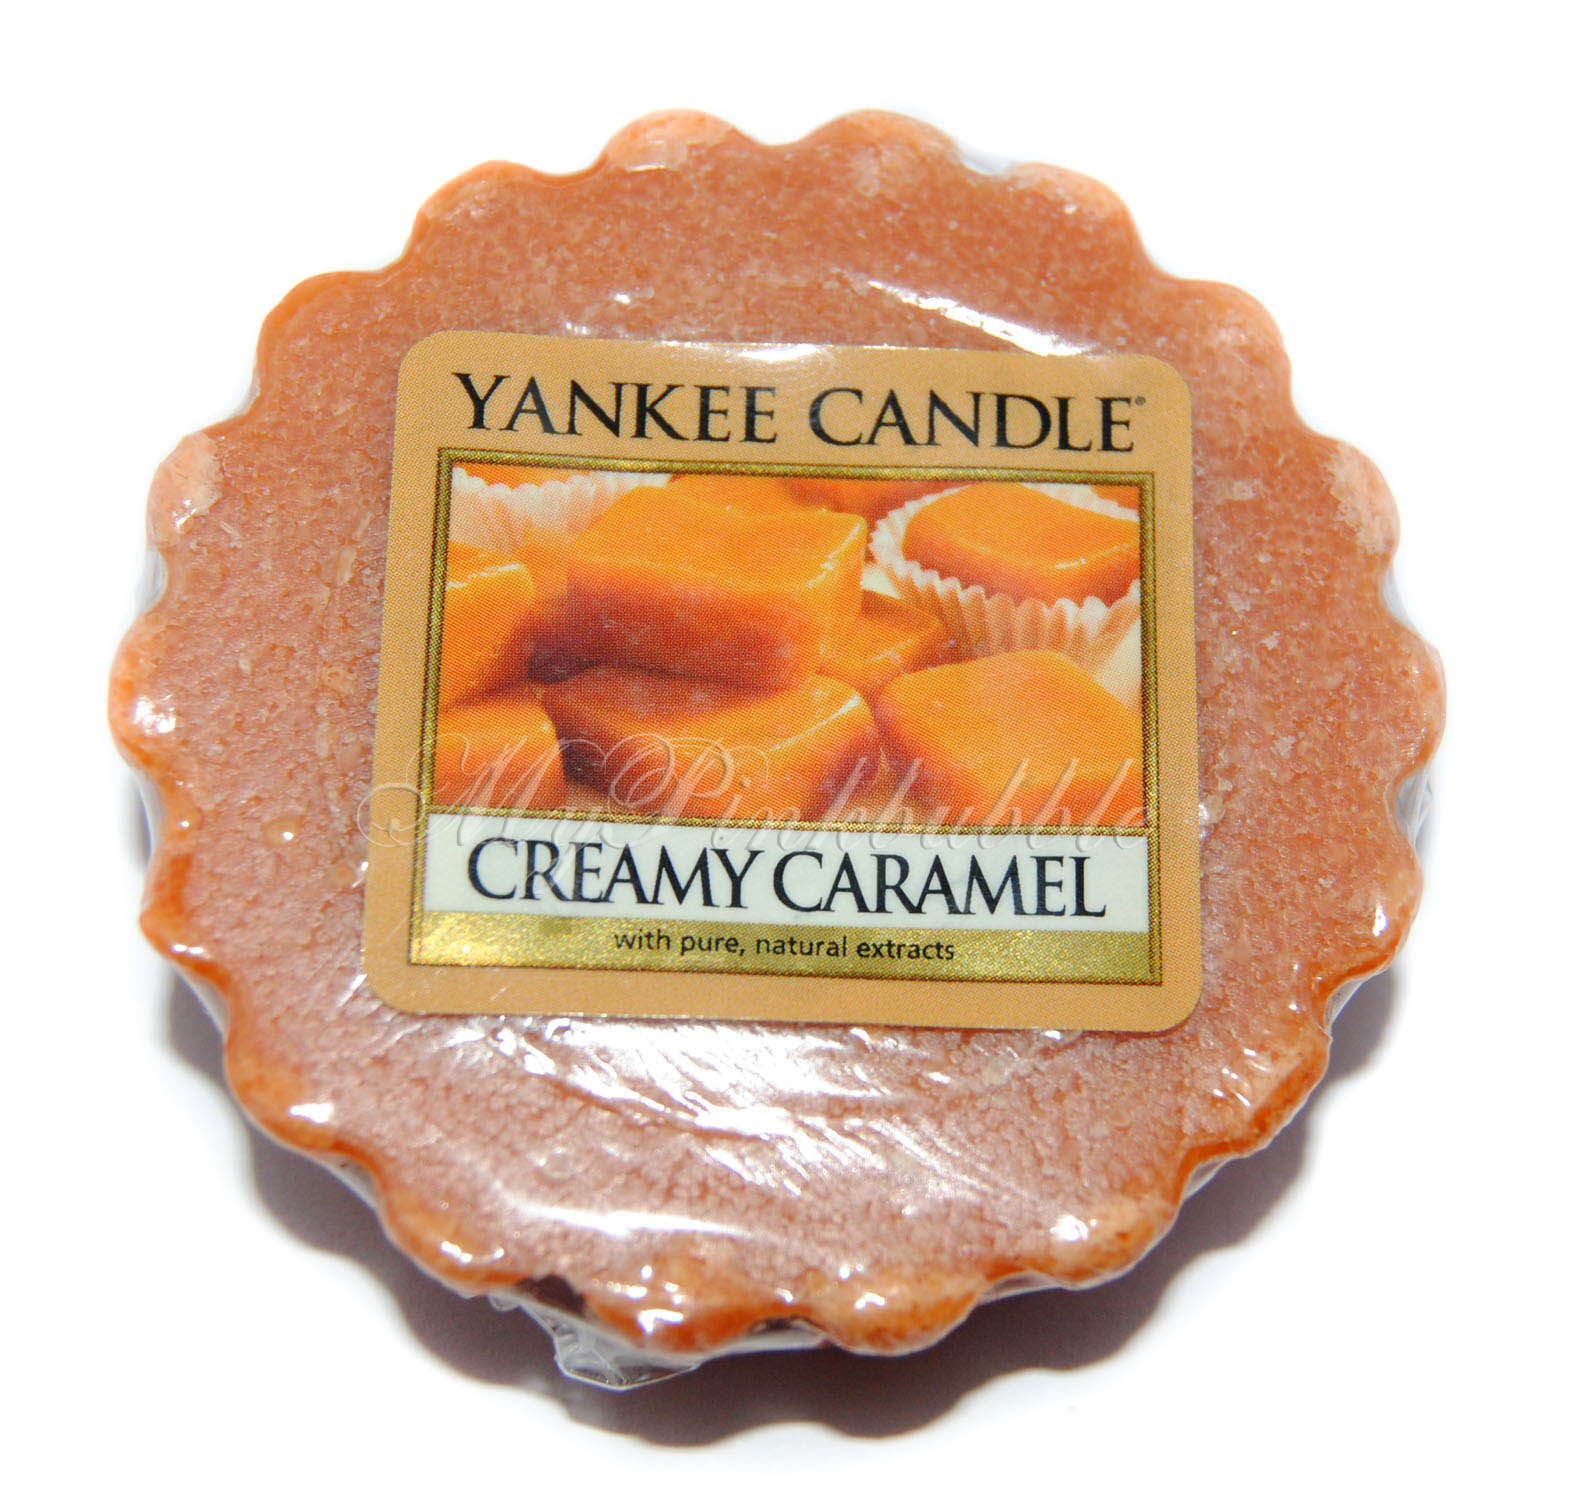 Yankee Candle Creamy Caramel